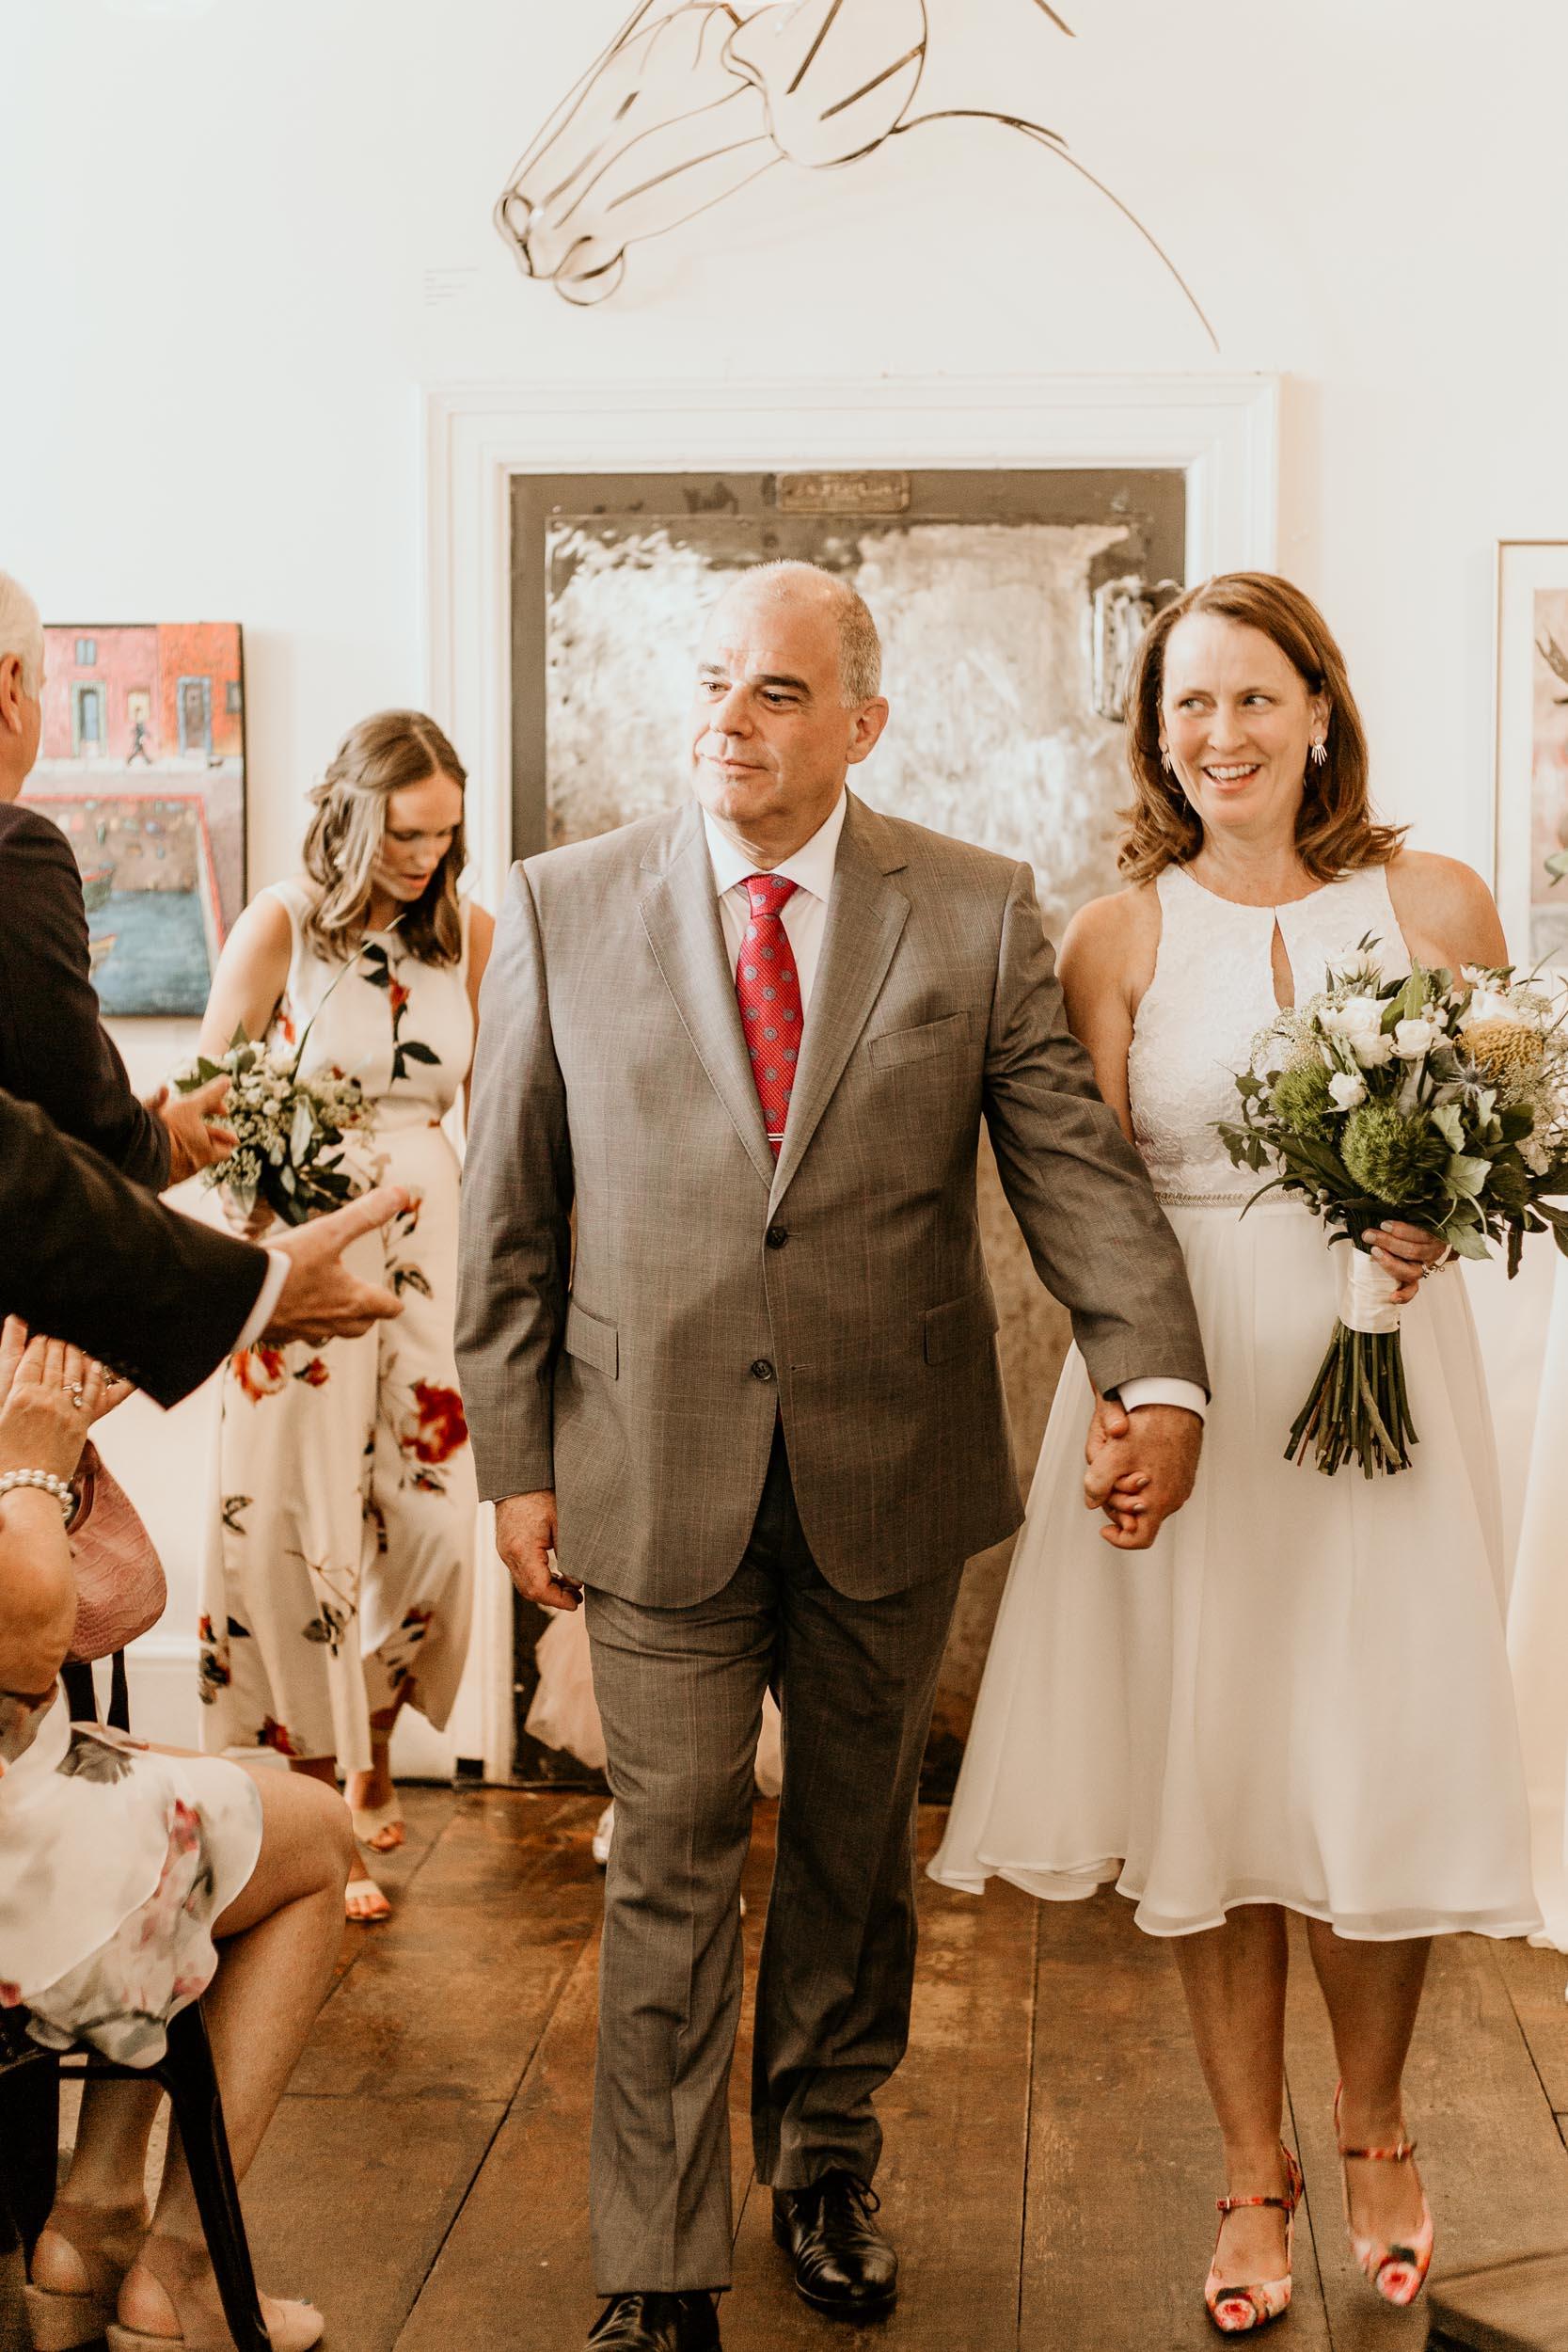 elopement-engagement-photographer-ottawa-4455.jpg